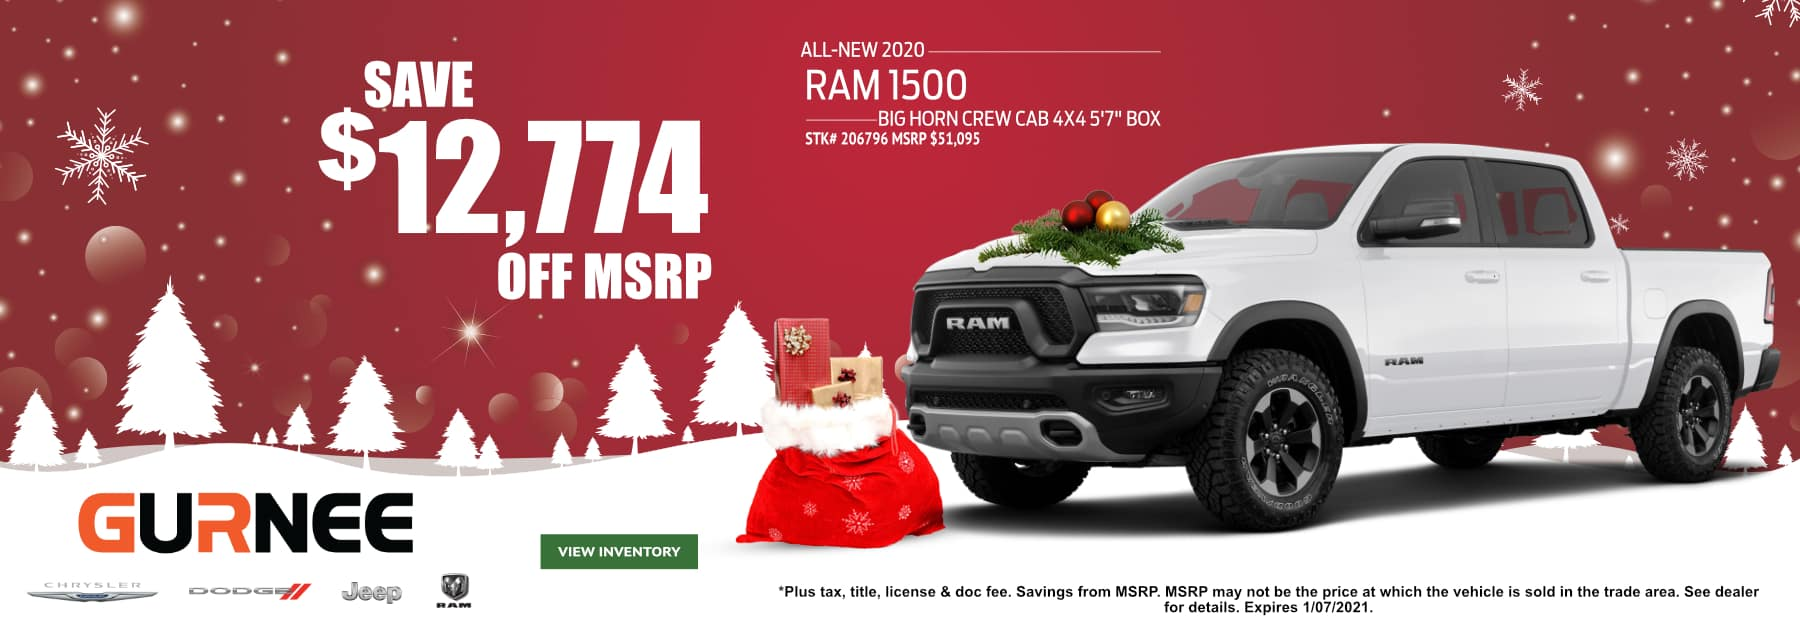 December-2020 Ram 1500_GURNEE